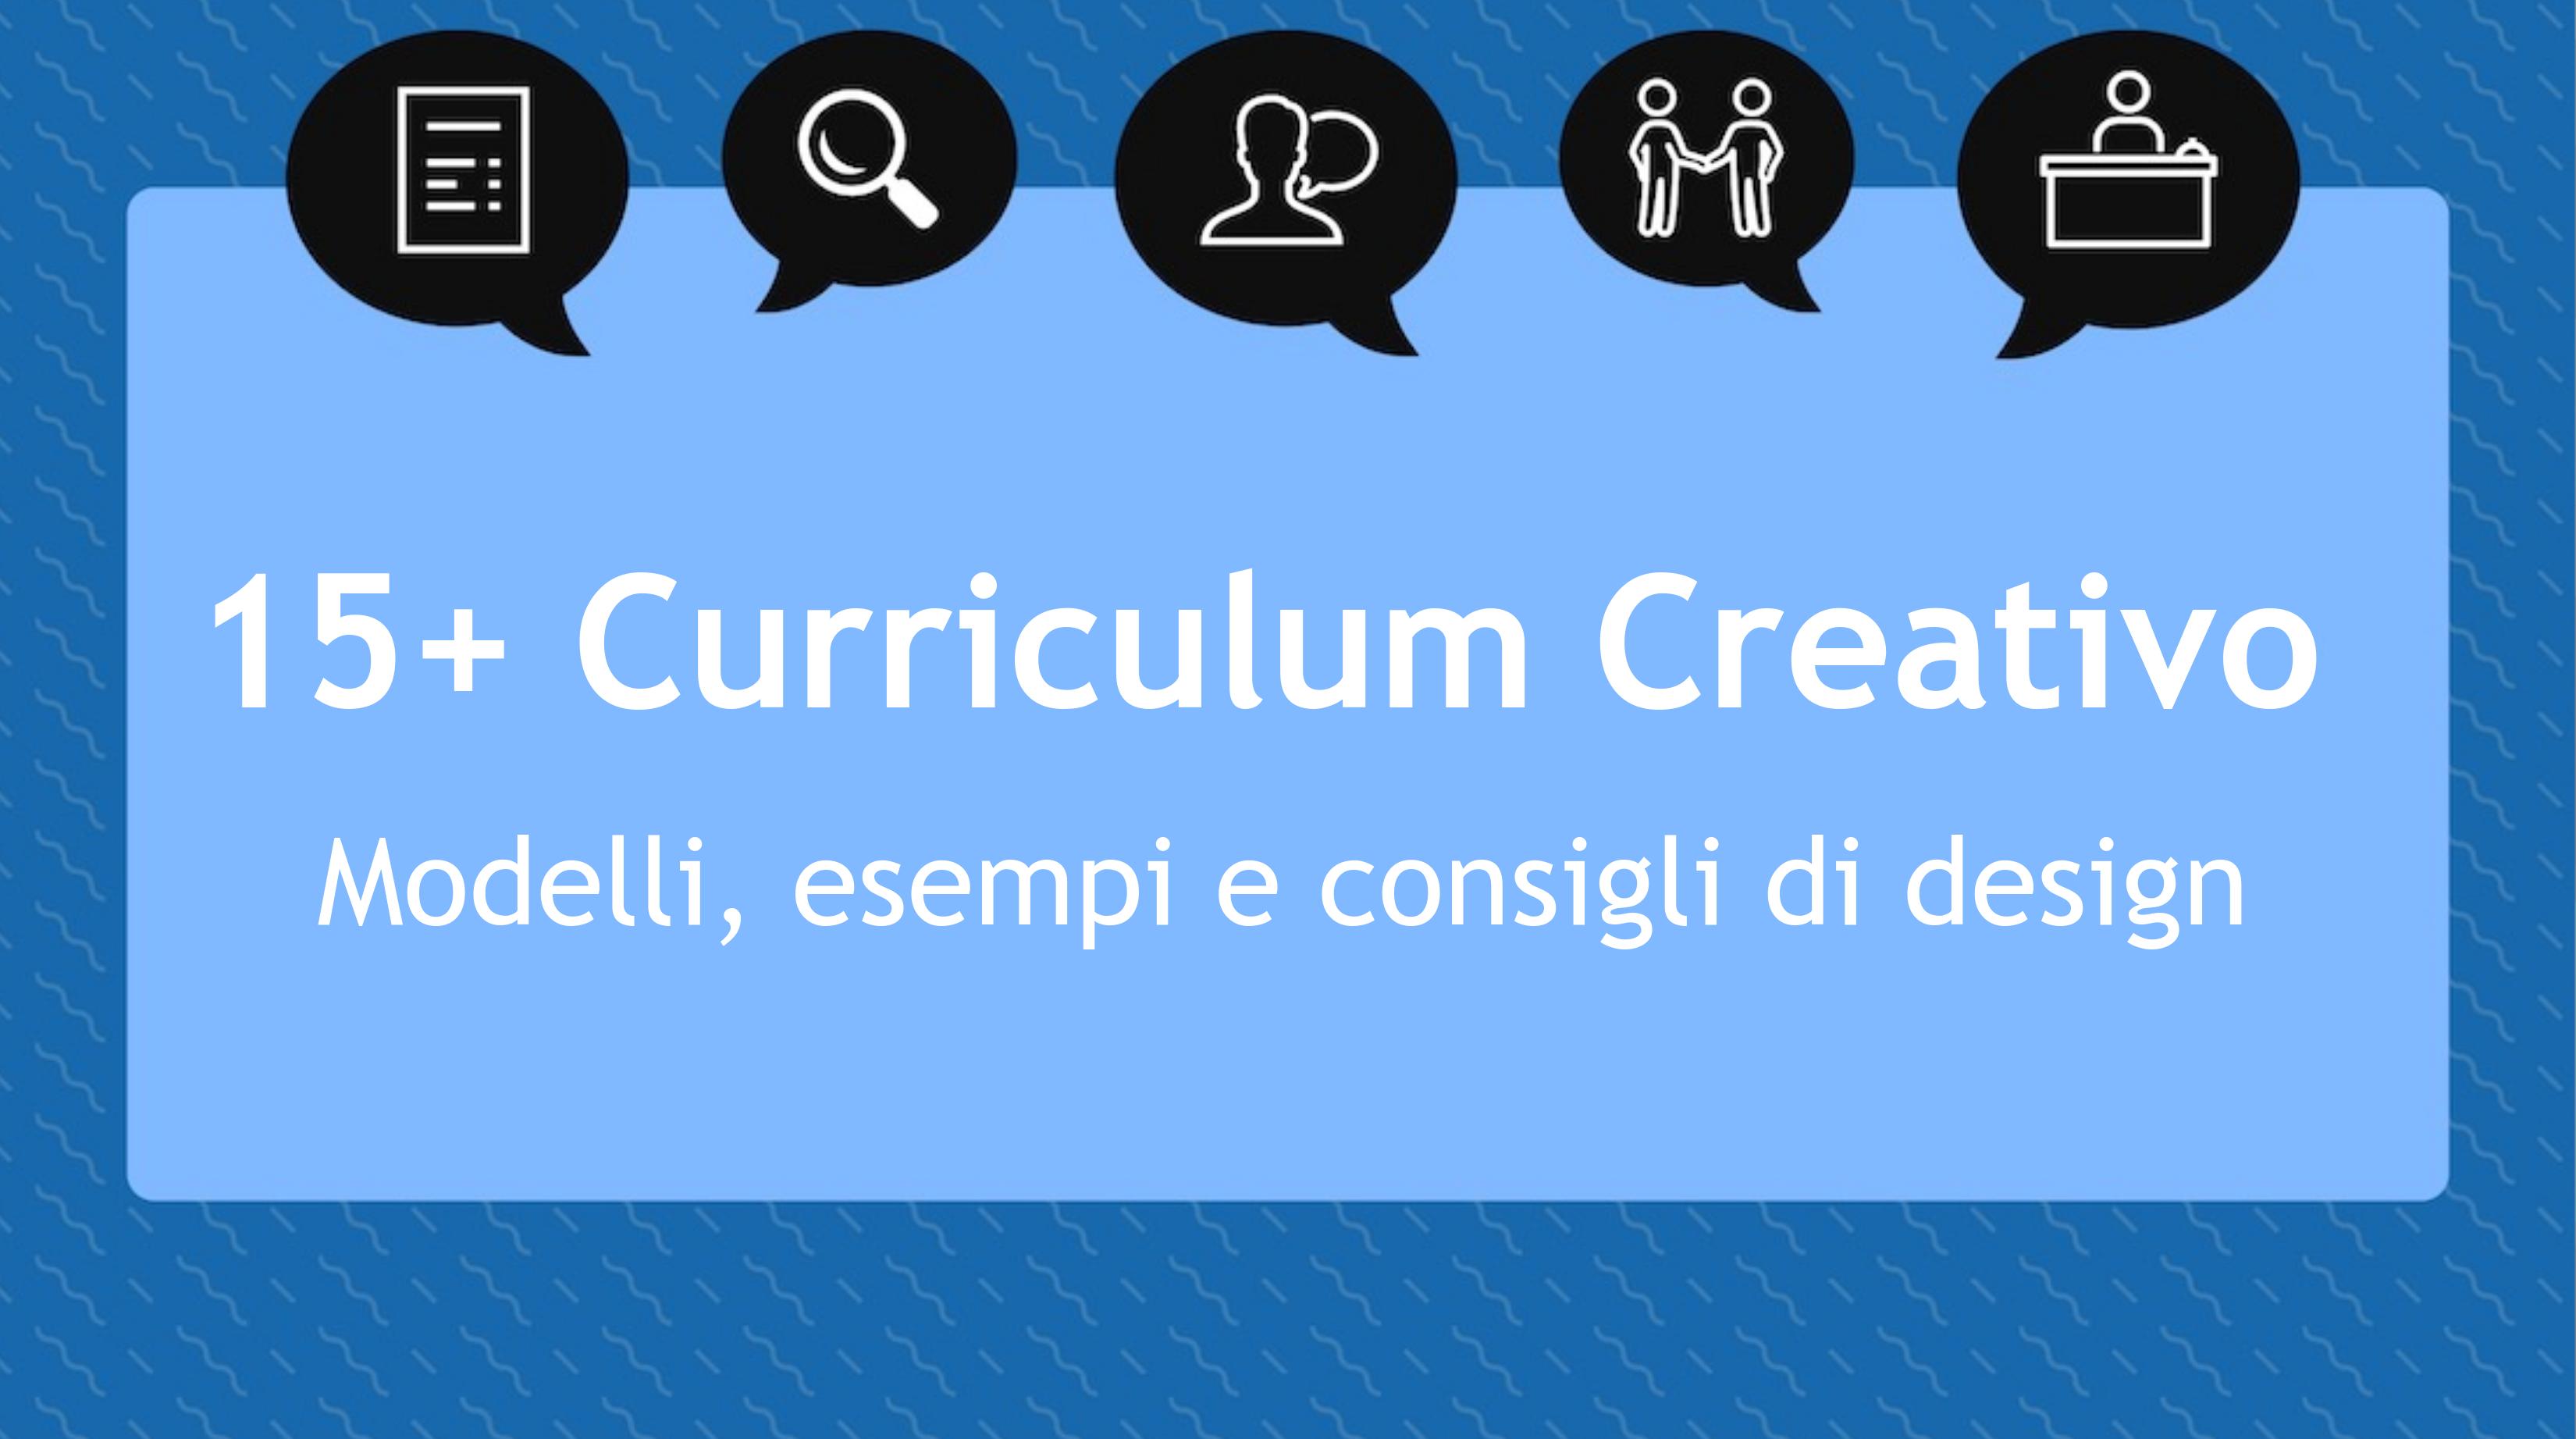 Curriculum creativo 15+ modelli, esempi e consigli di design